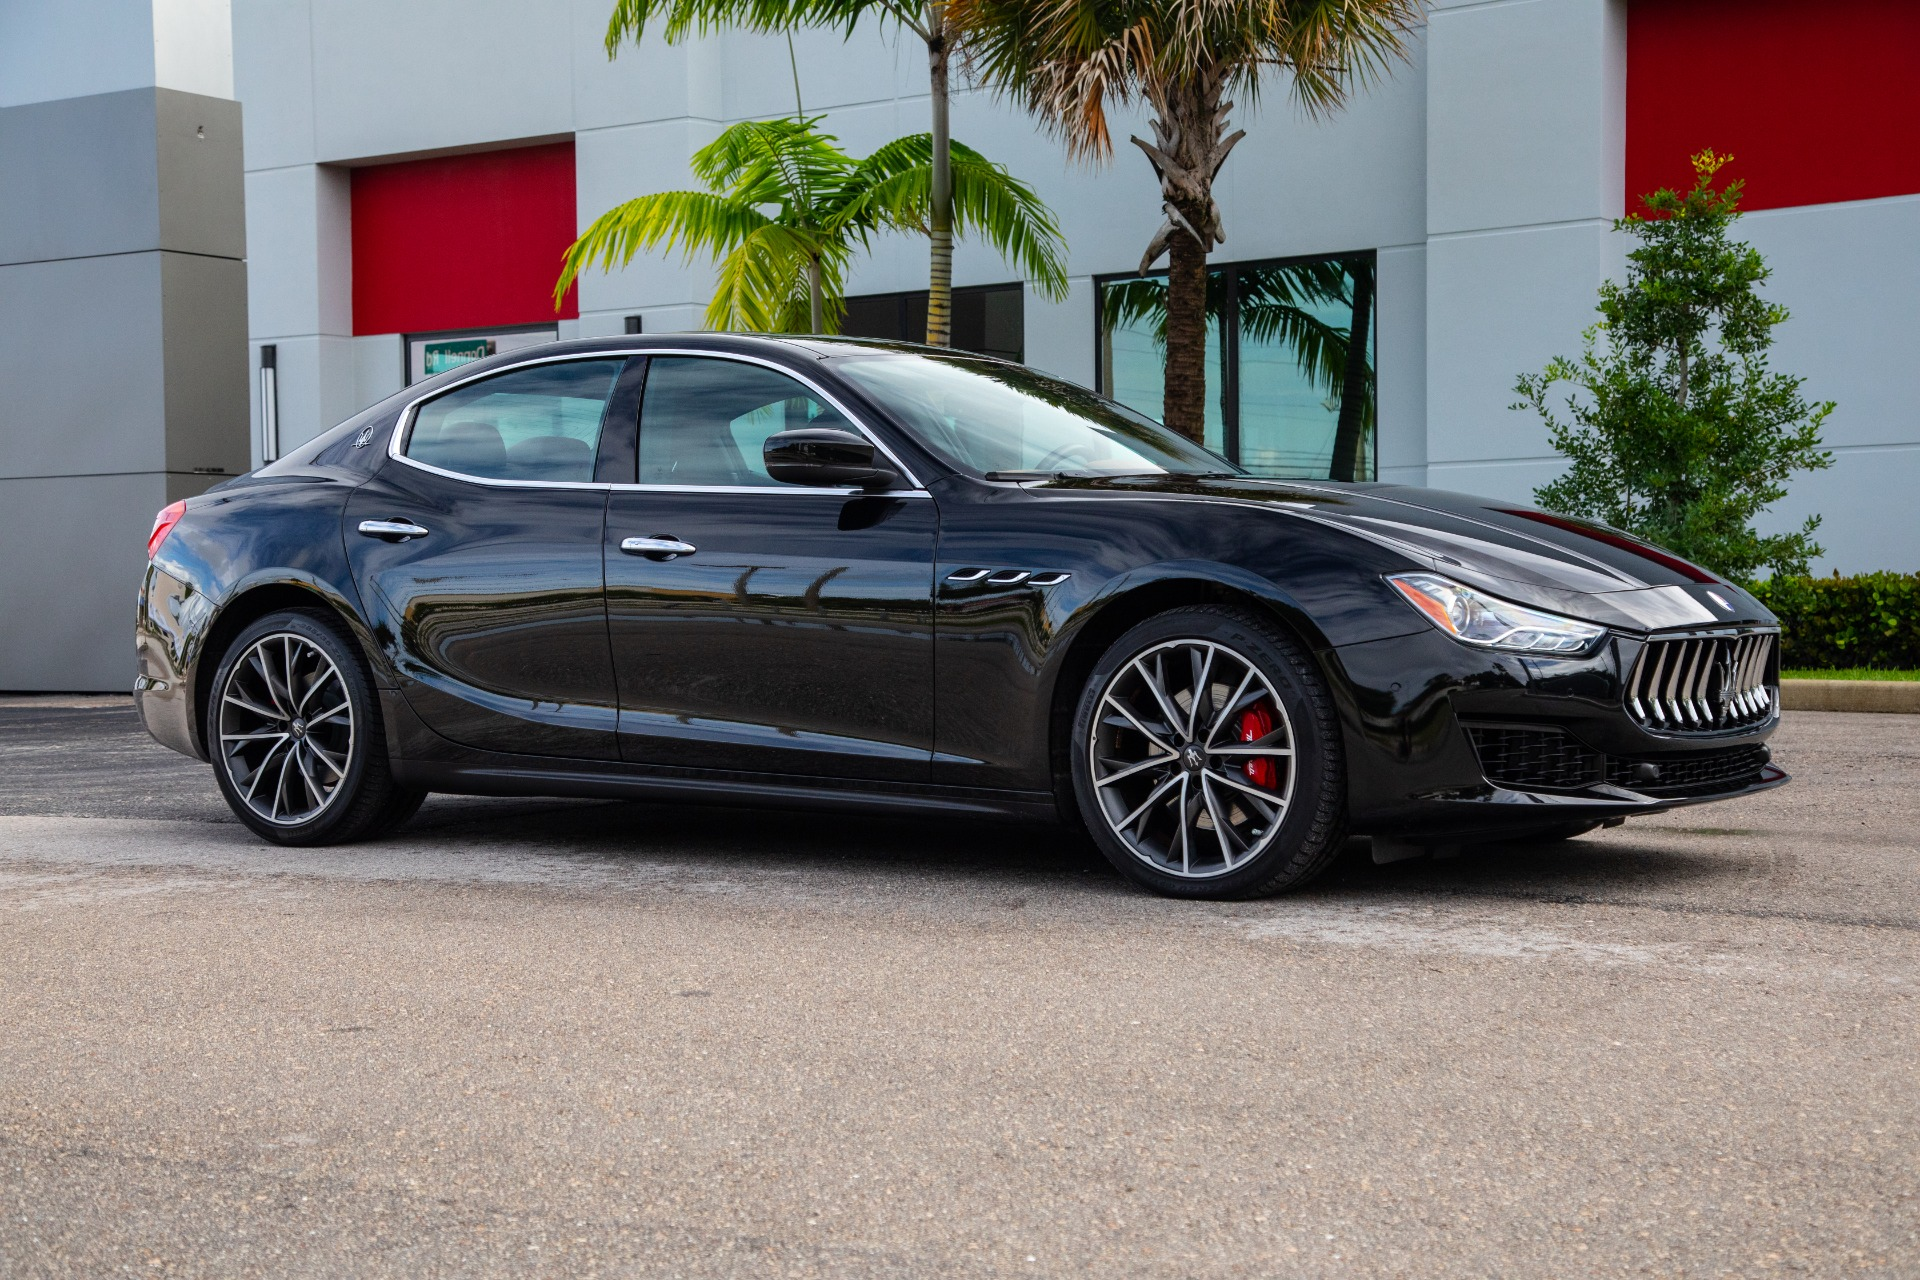 Used 2019 Maserati Ghibli For Sale ($49,900) | Marino Performance Motors Stock #316553